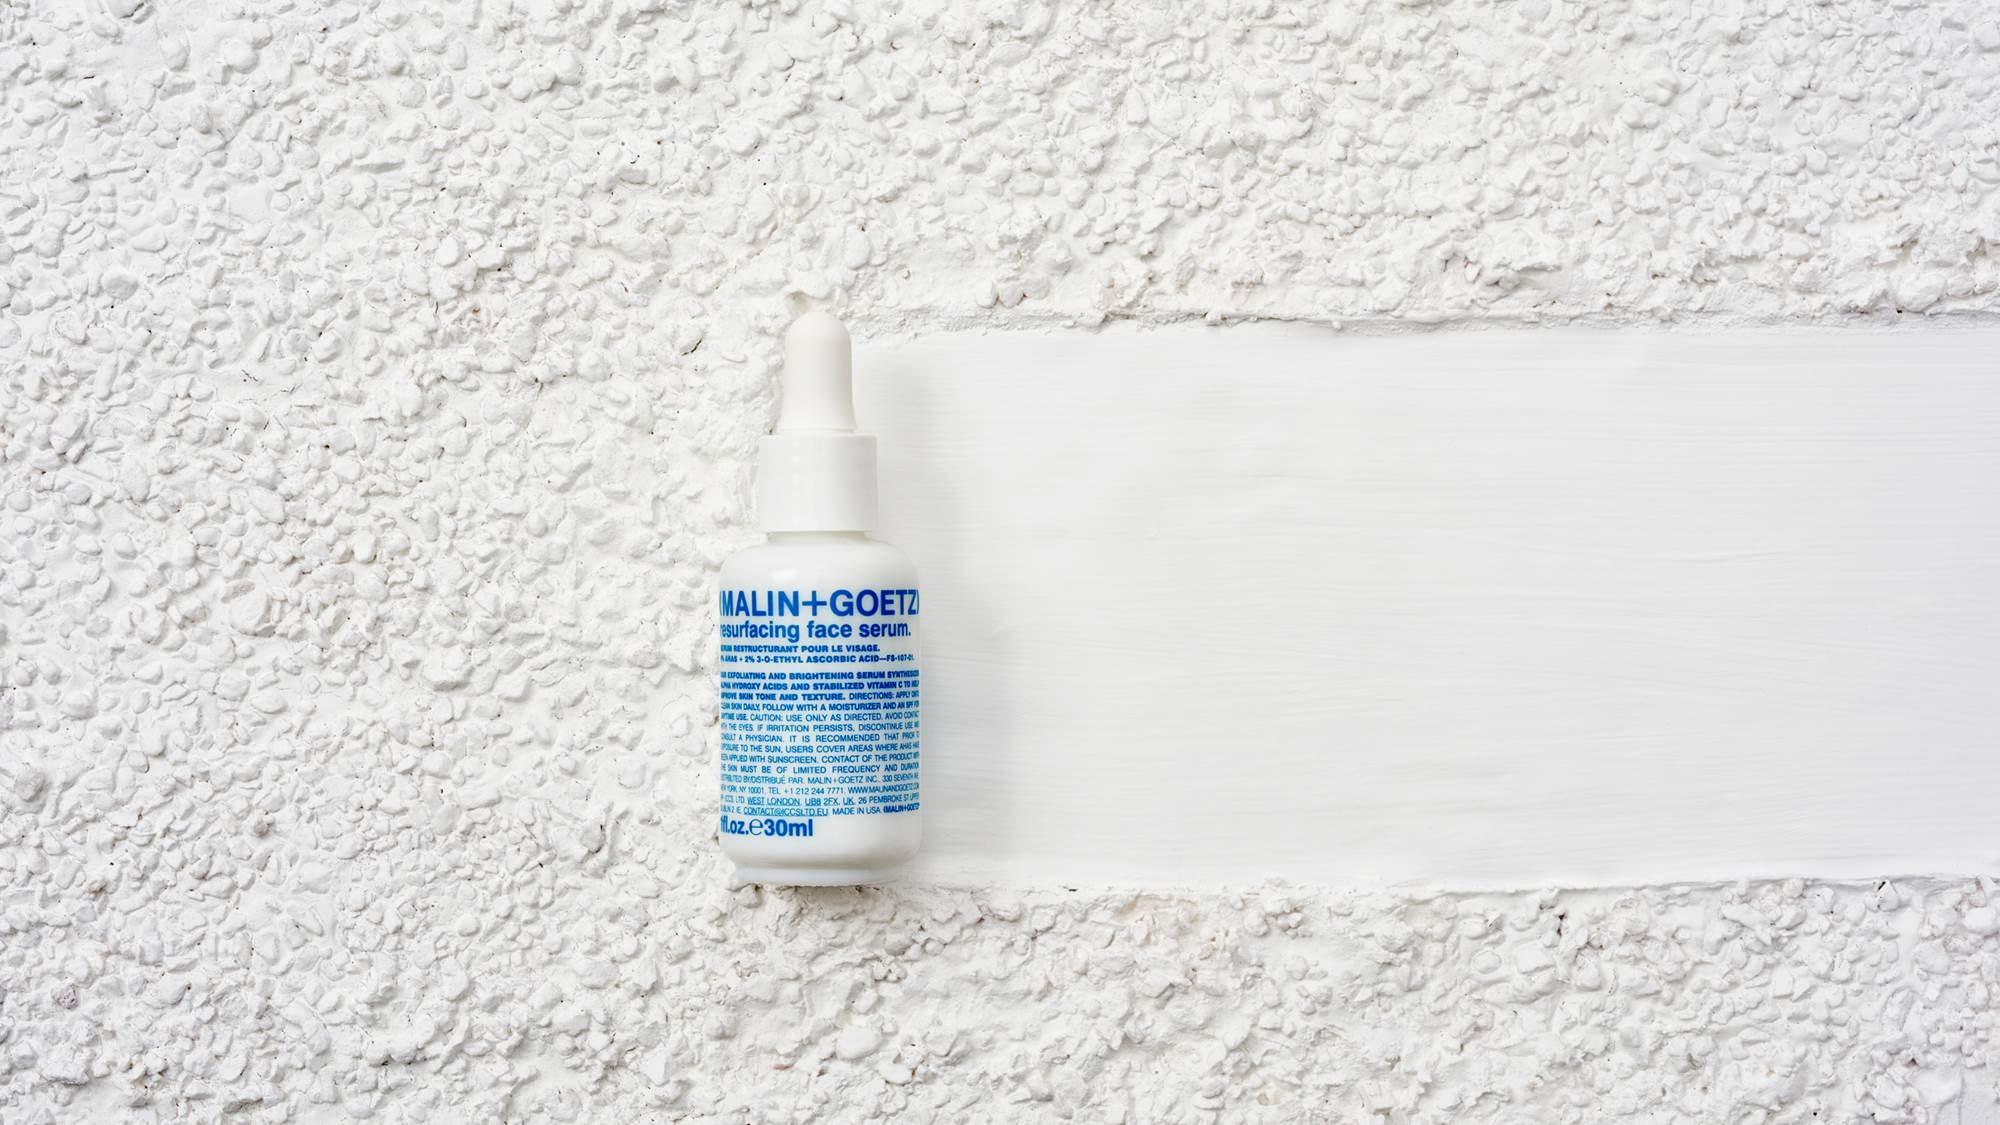 Malin Goetz S New Resurfacing Face Serum Offers Chemical